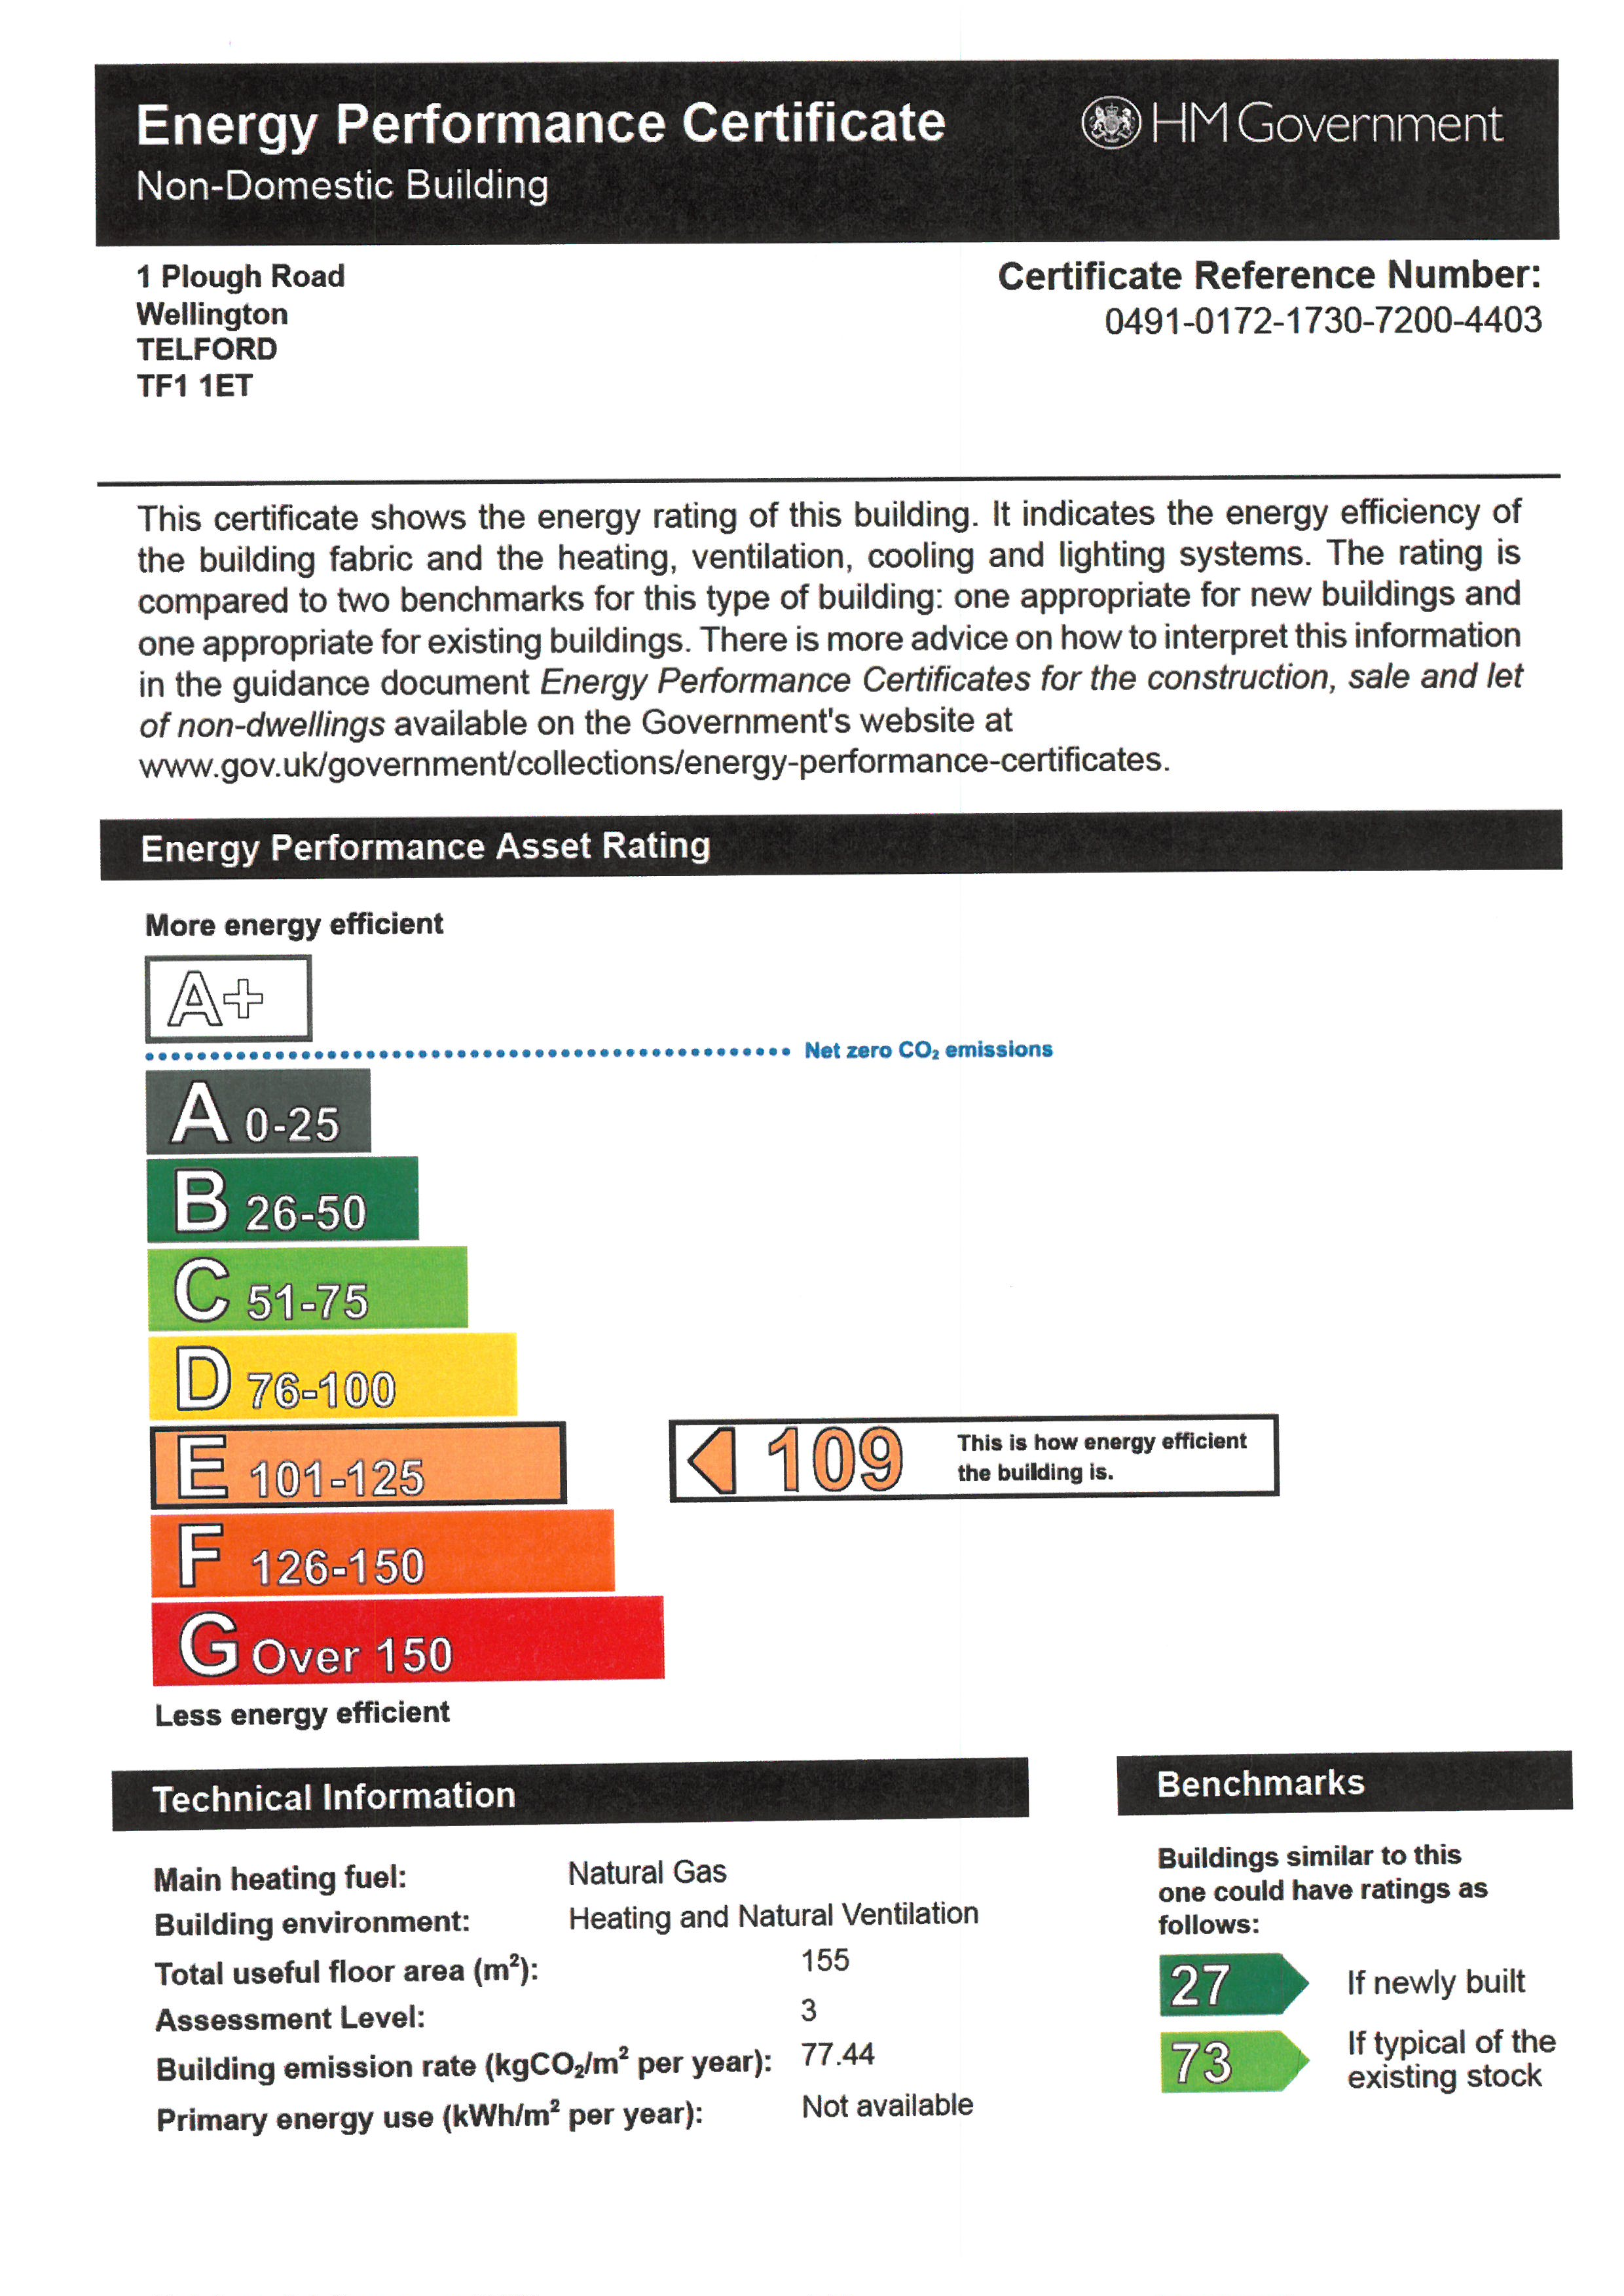 EPC for Plough Road, Wellington, Telford, Shropshire, tf1 1et